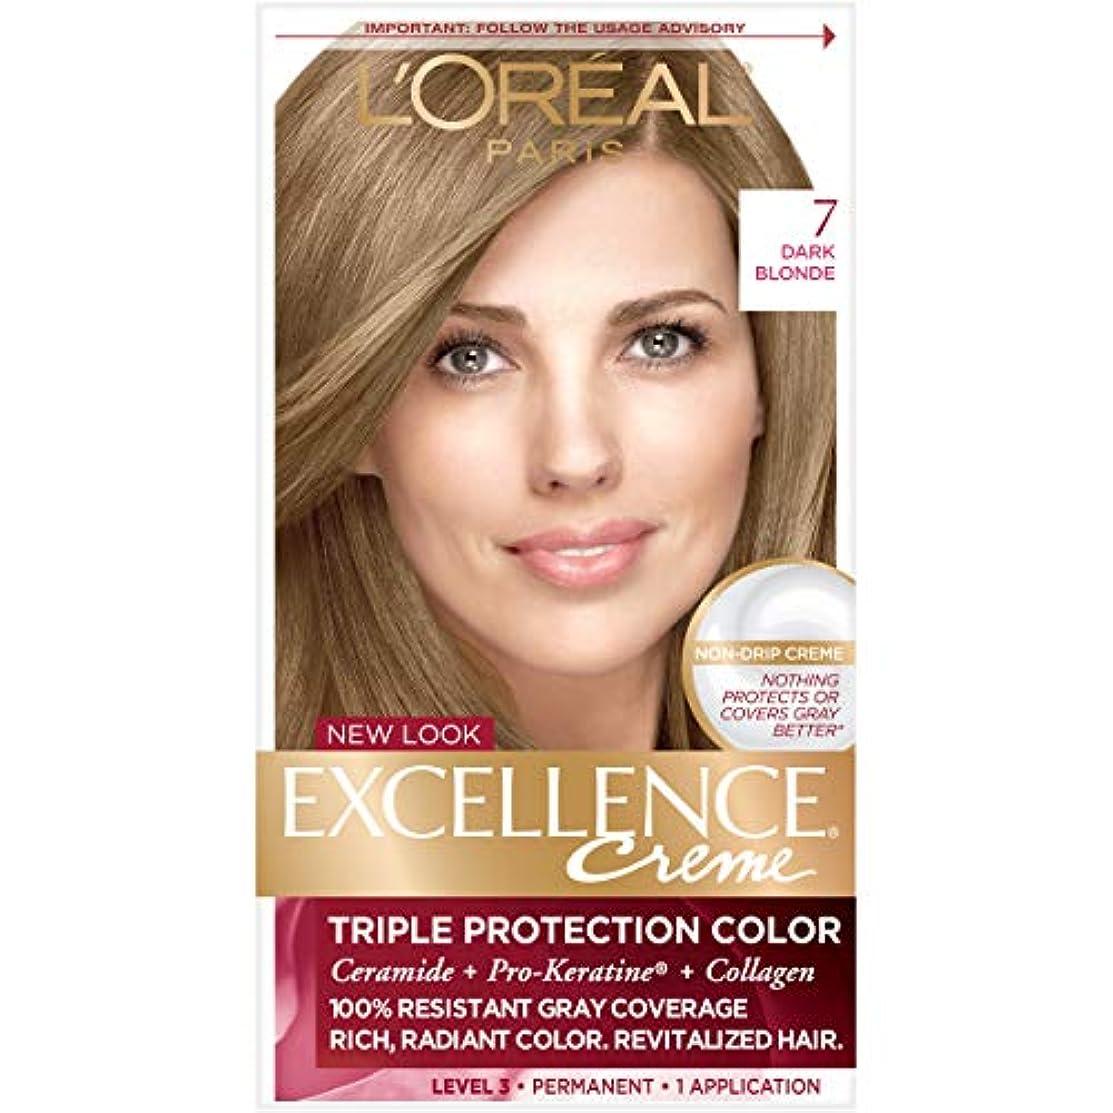 L'Oreal Excellence Creme Haircolor Dark Blonde (並行輸入品)